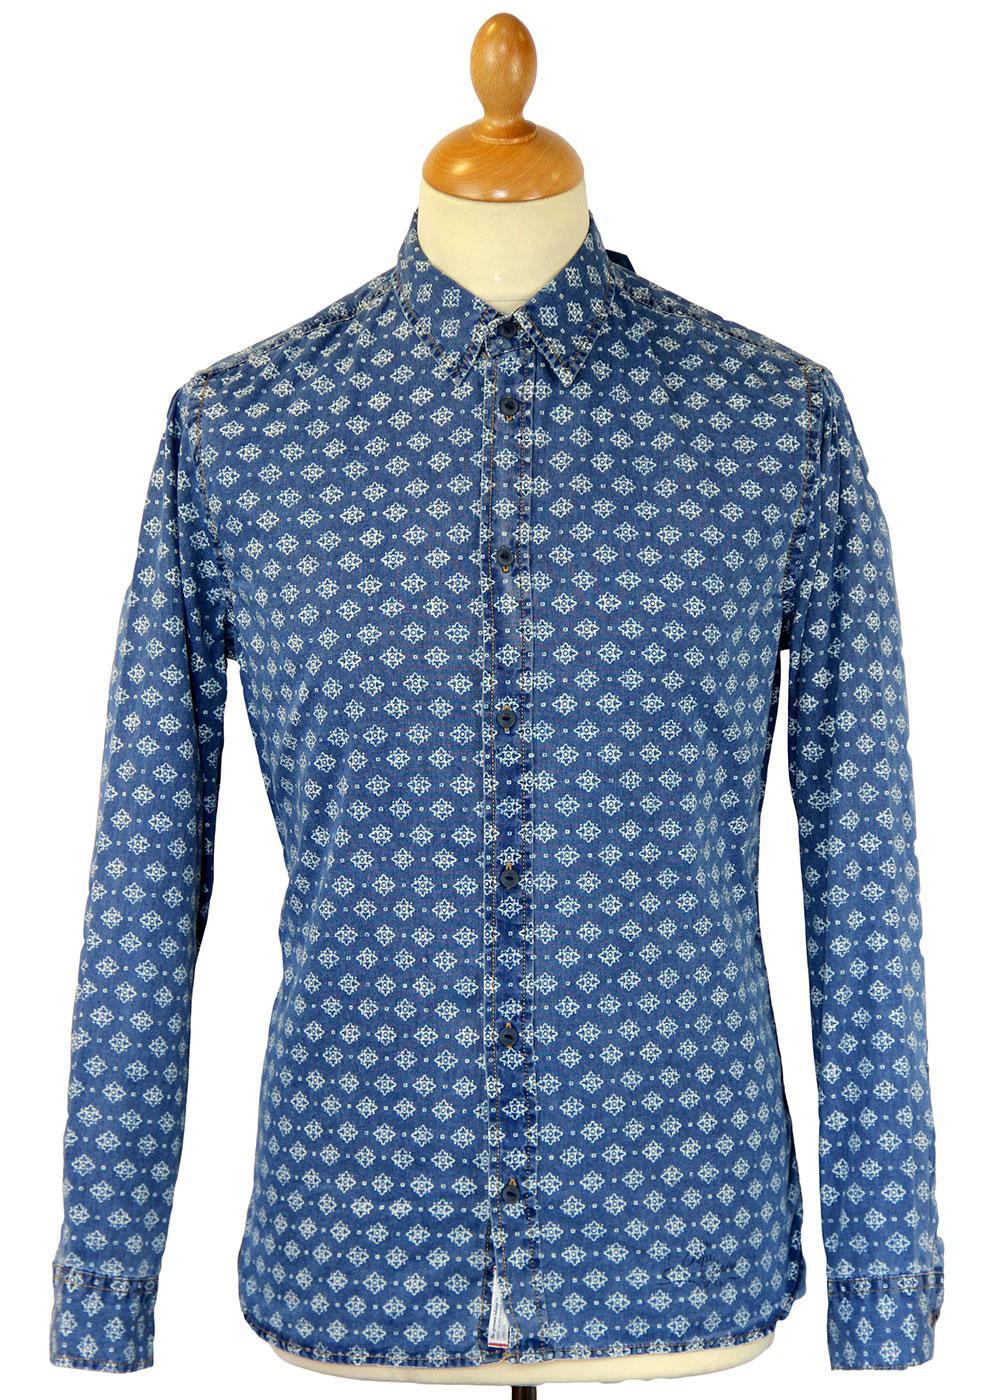 Latrobe Pepe Jeans Retro 70s Indigo Dye Geo Shirt